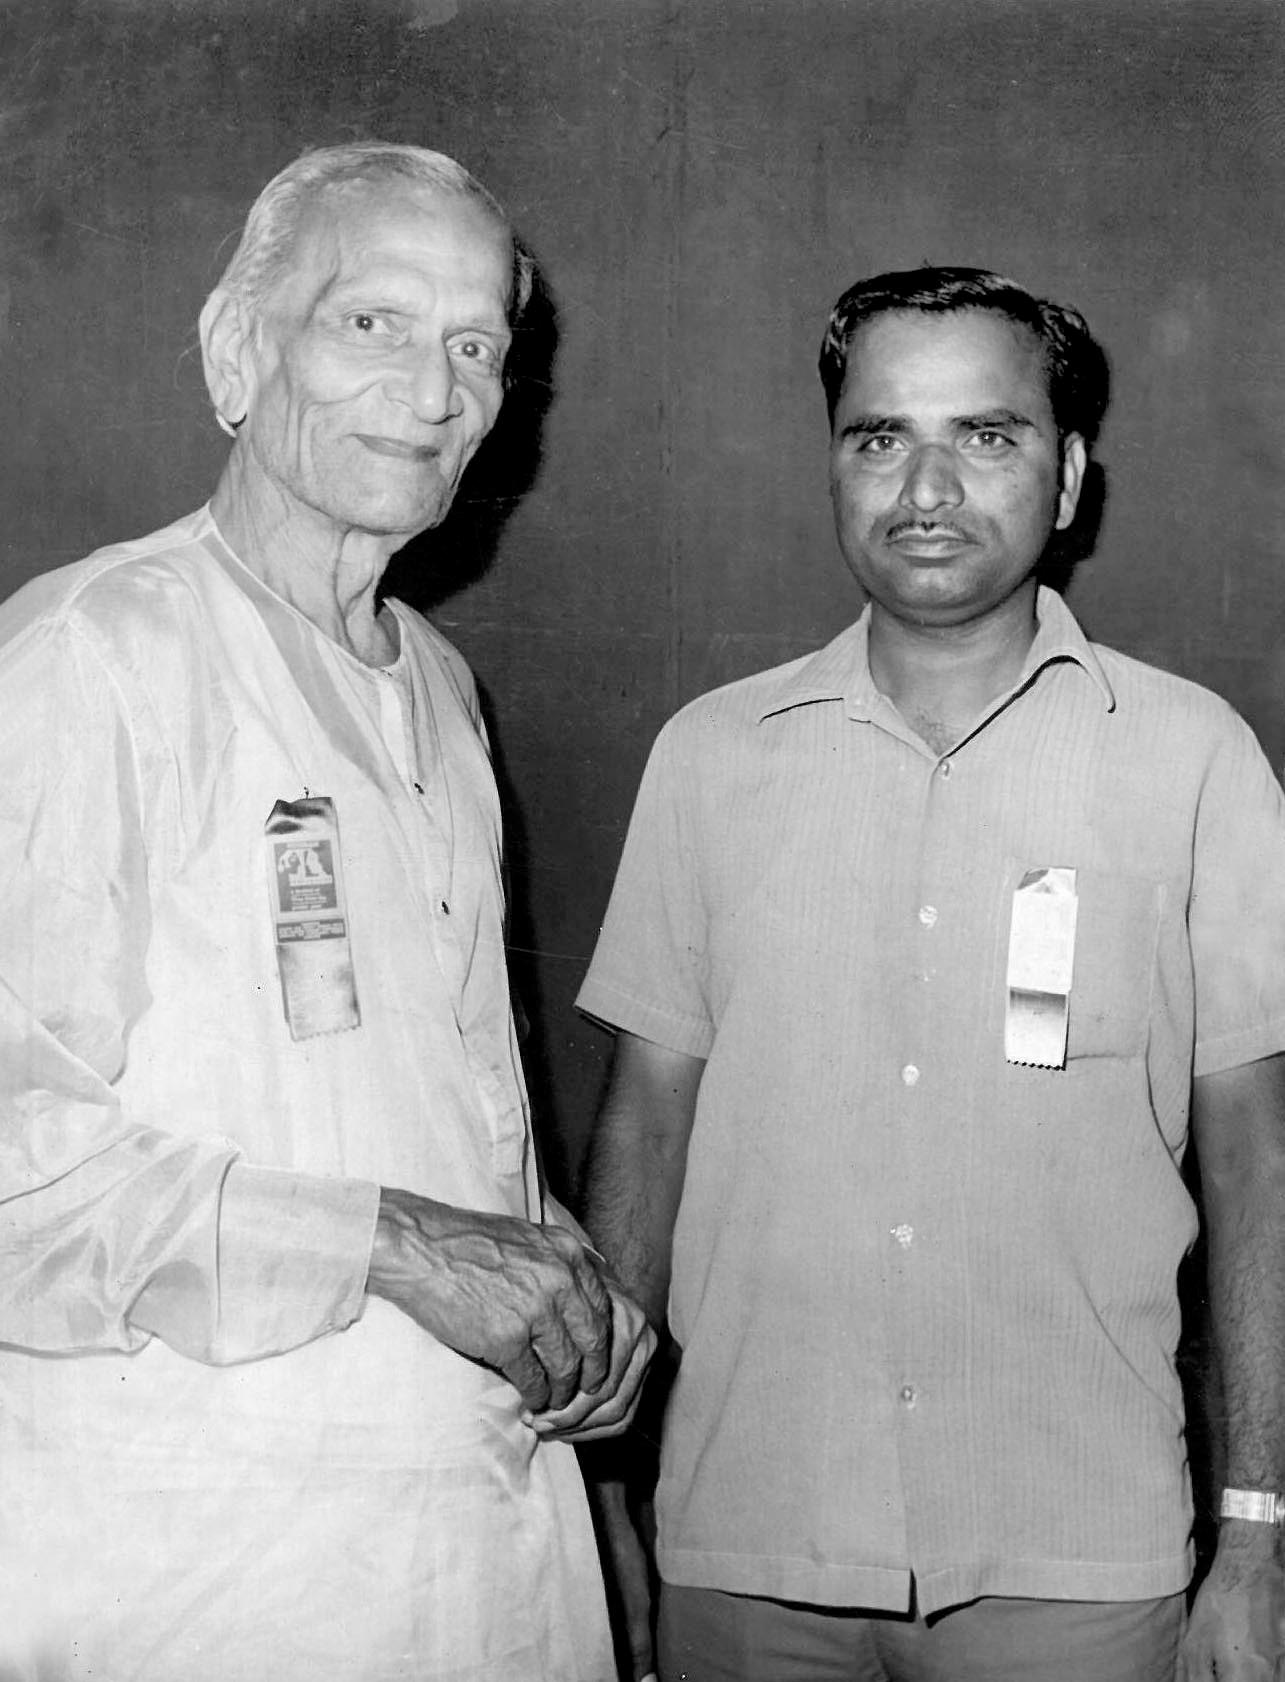 HN Narahari Rao with RC Boral at Nostalgia in 1977